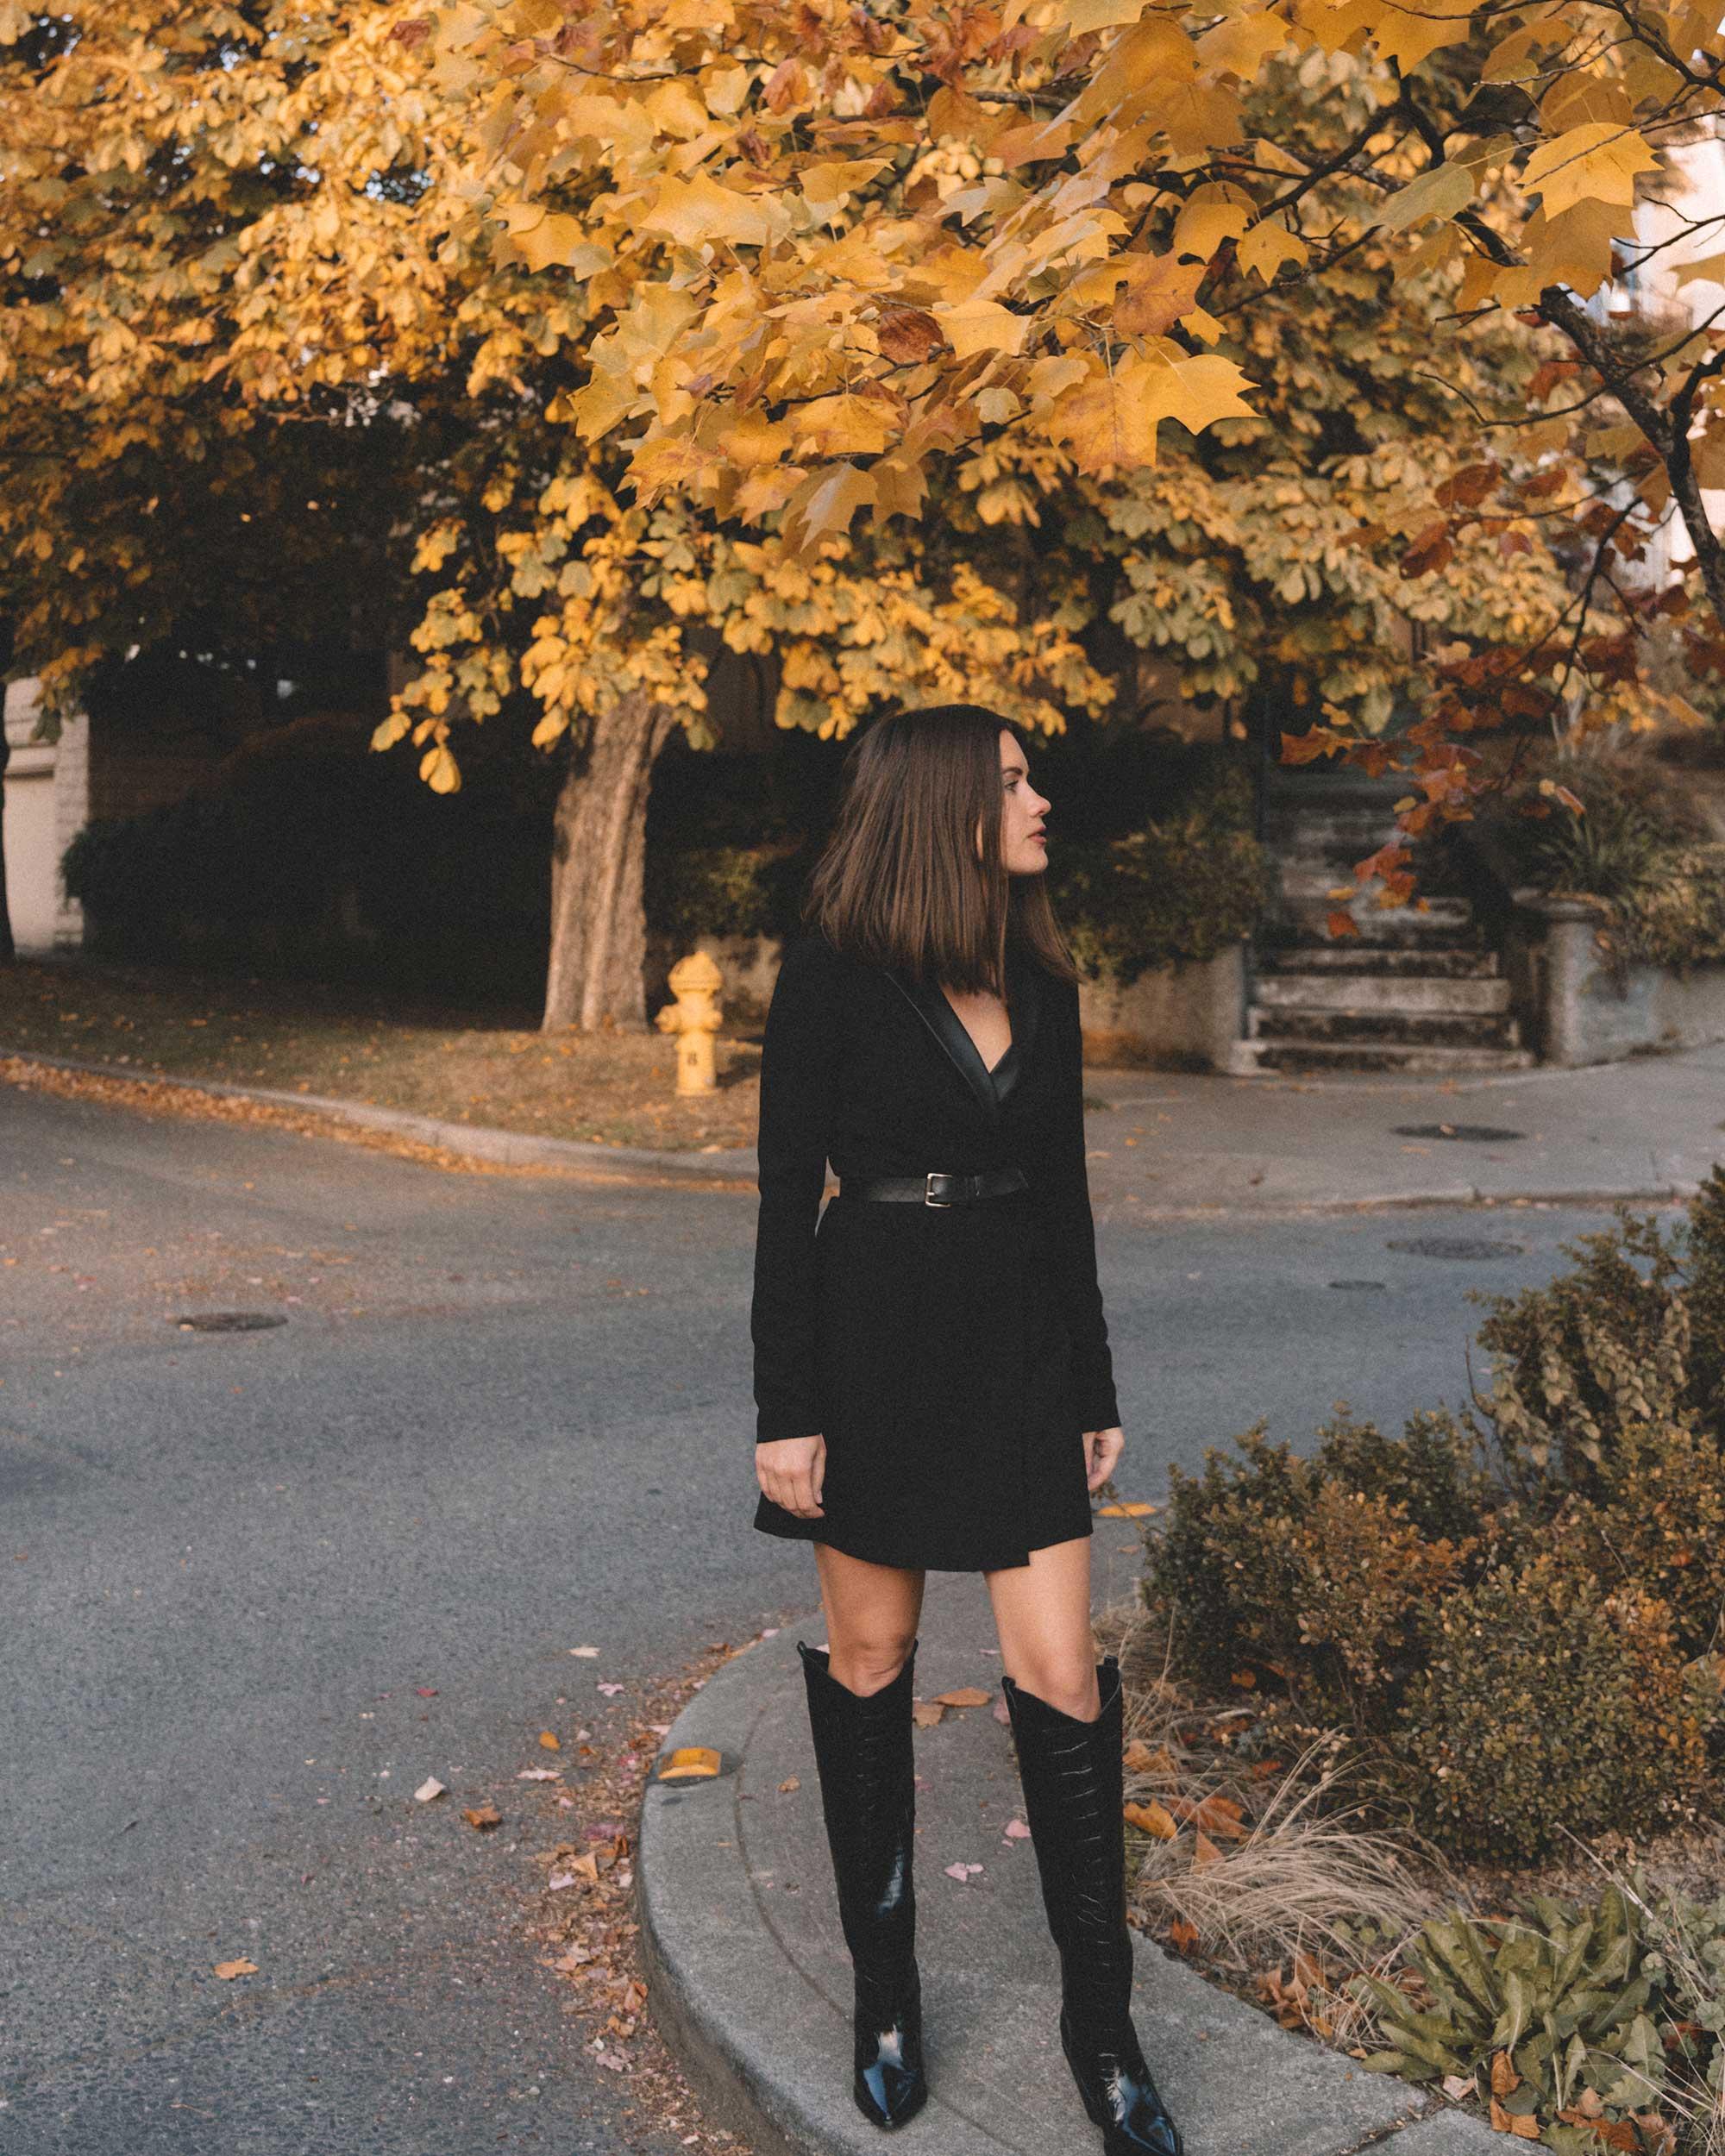 bcbgeneration blazer dress in black, Sigerson Morrison Karida Black Leather Knee High Boot, fall outfit 2.jpg